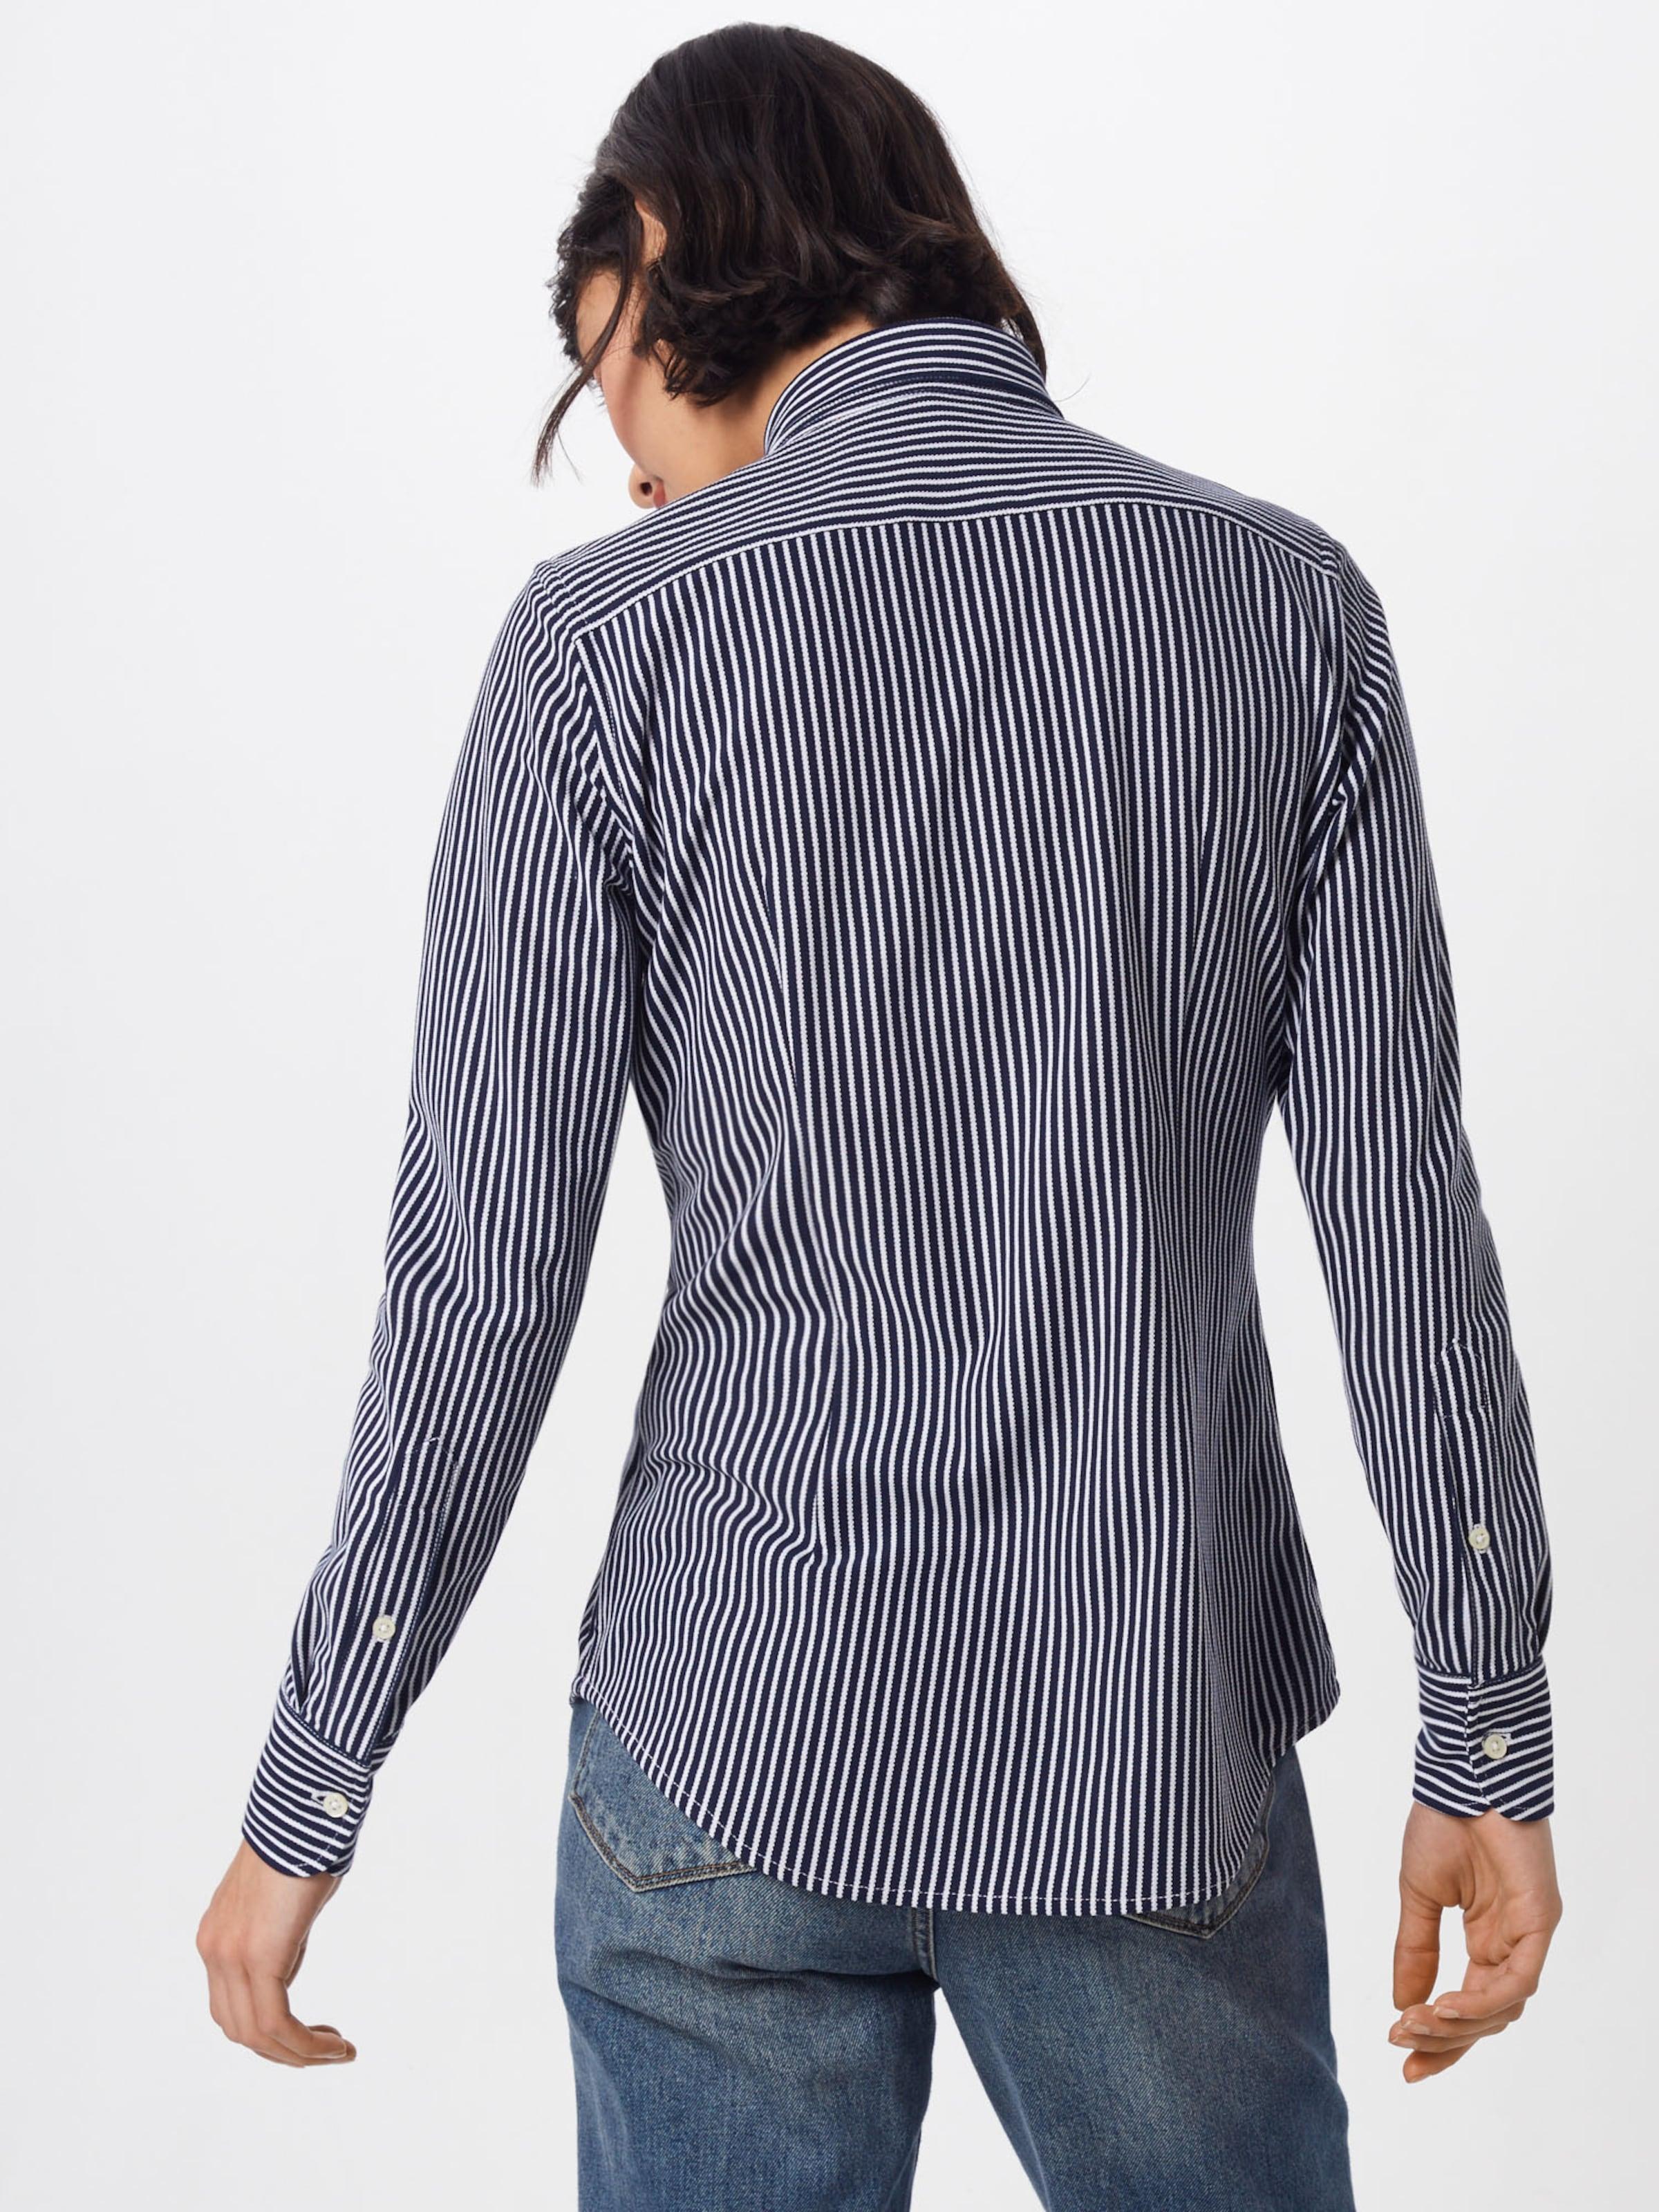 In NavyWeiß Hemd Polo Ralph Lauren 5AR4j3L